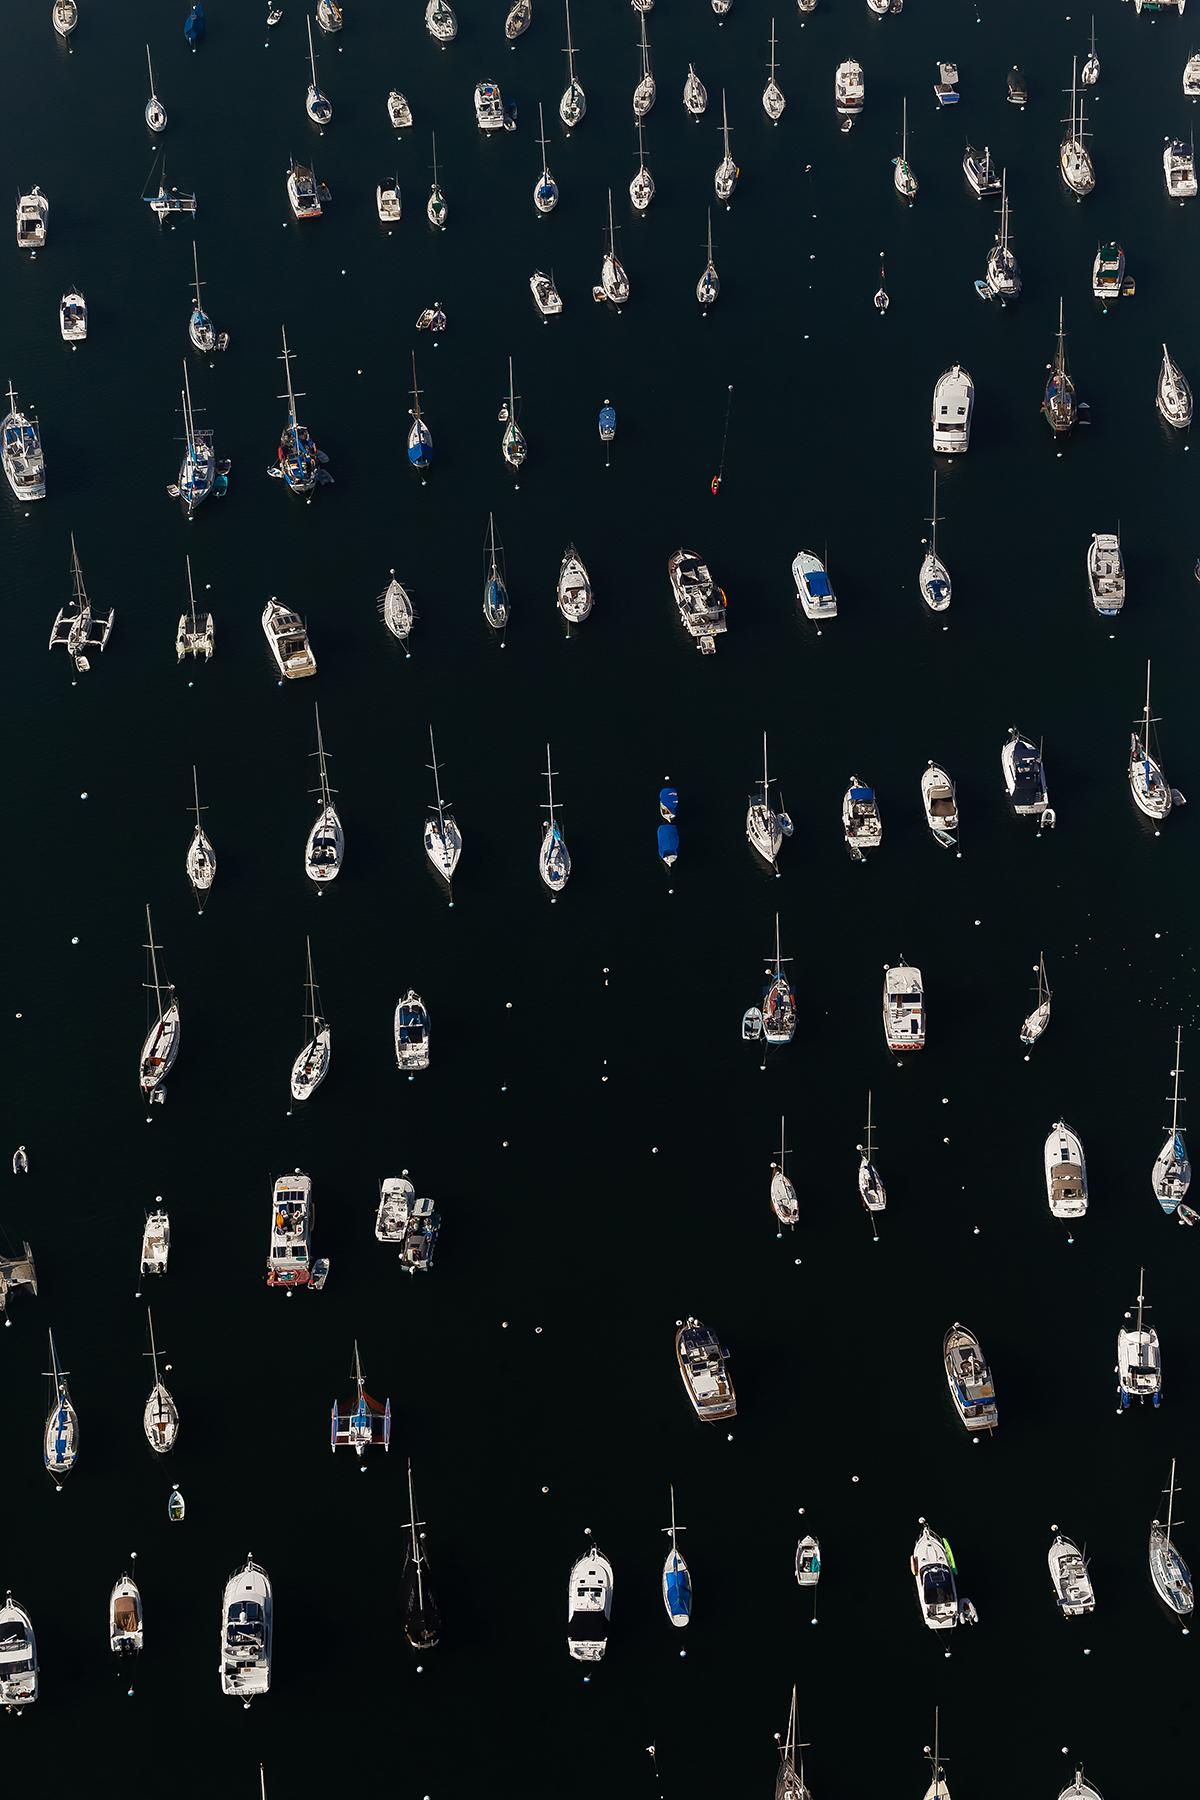 Boat Floats by Ryan Garvin